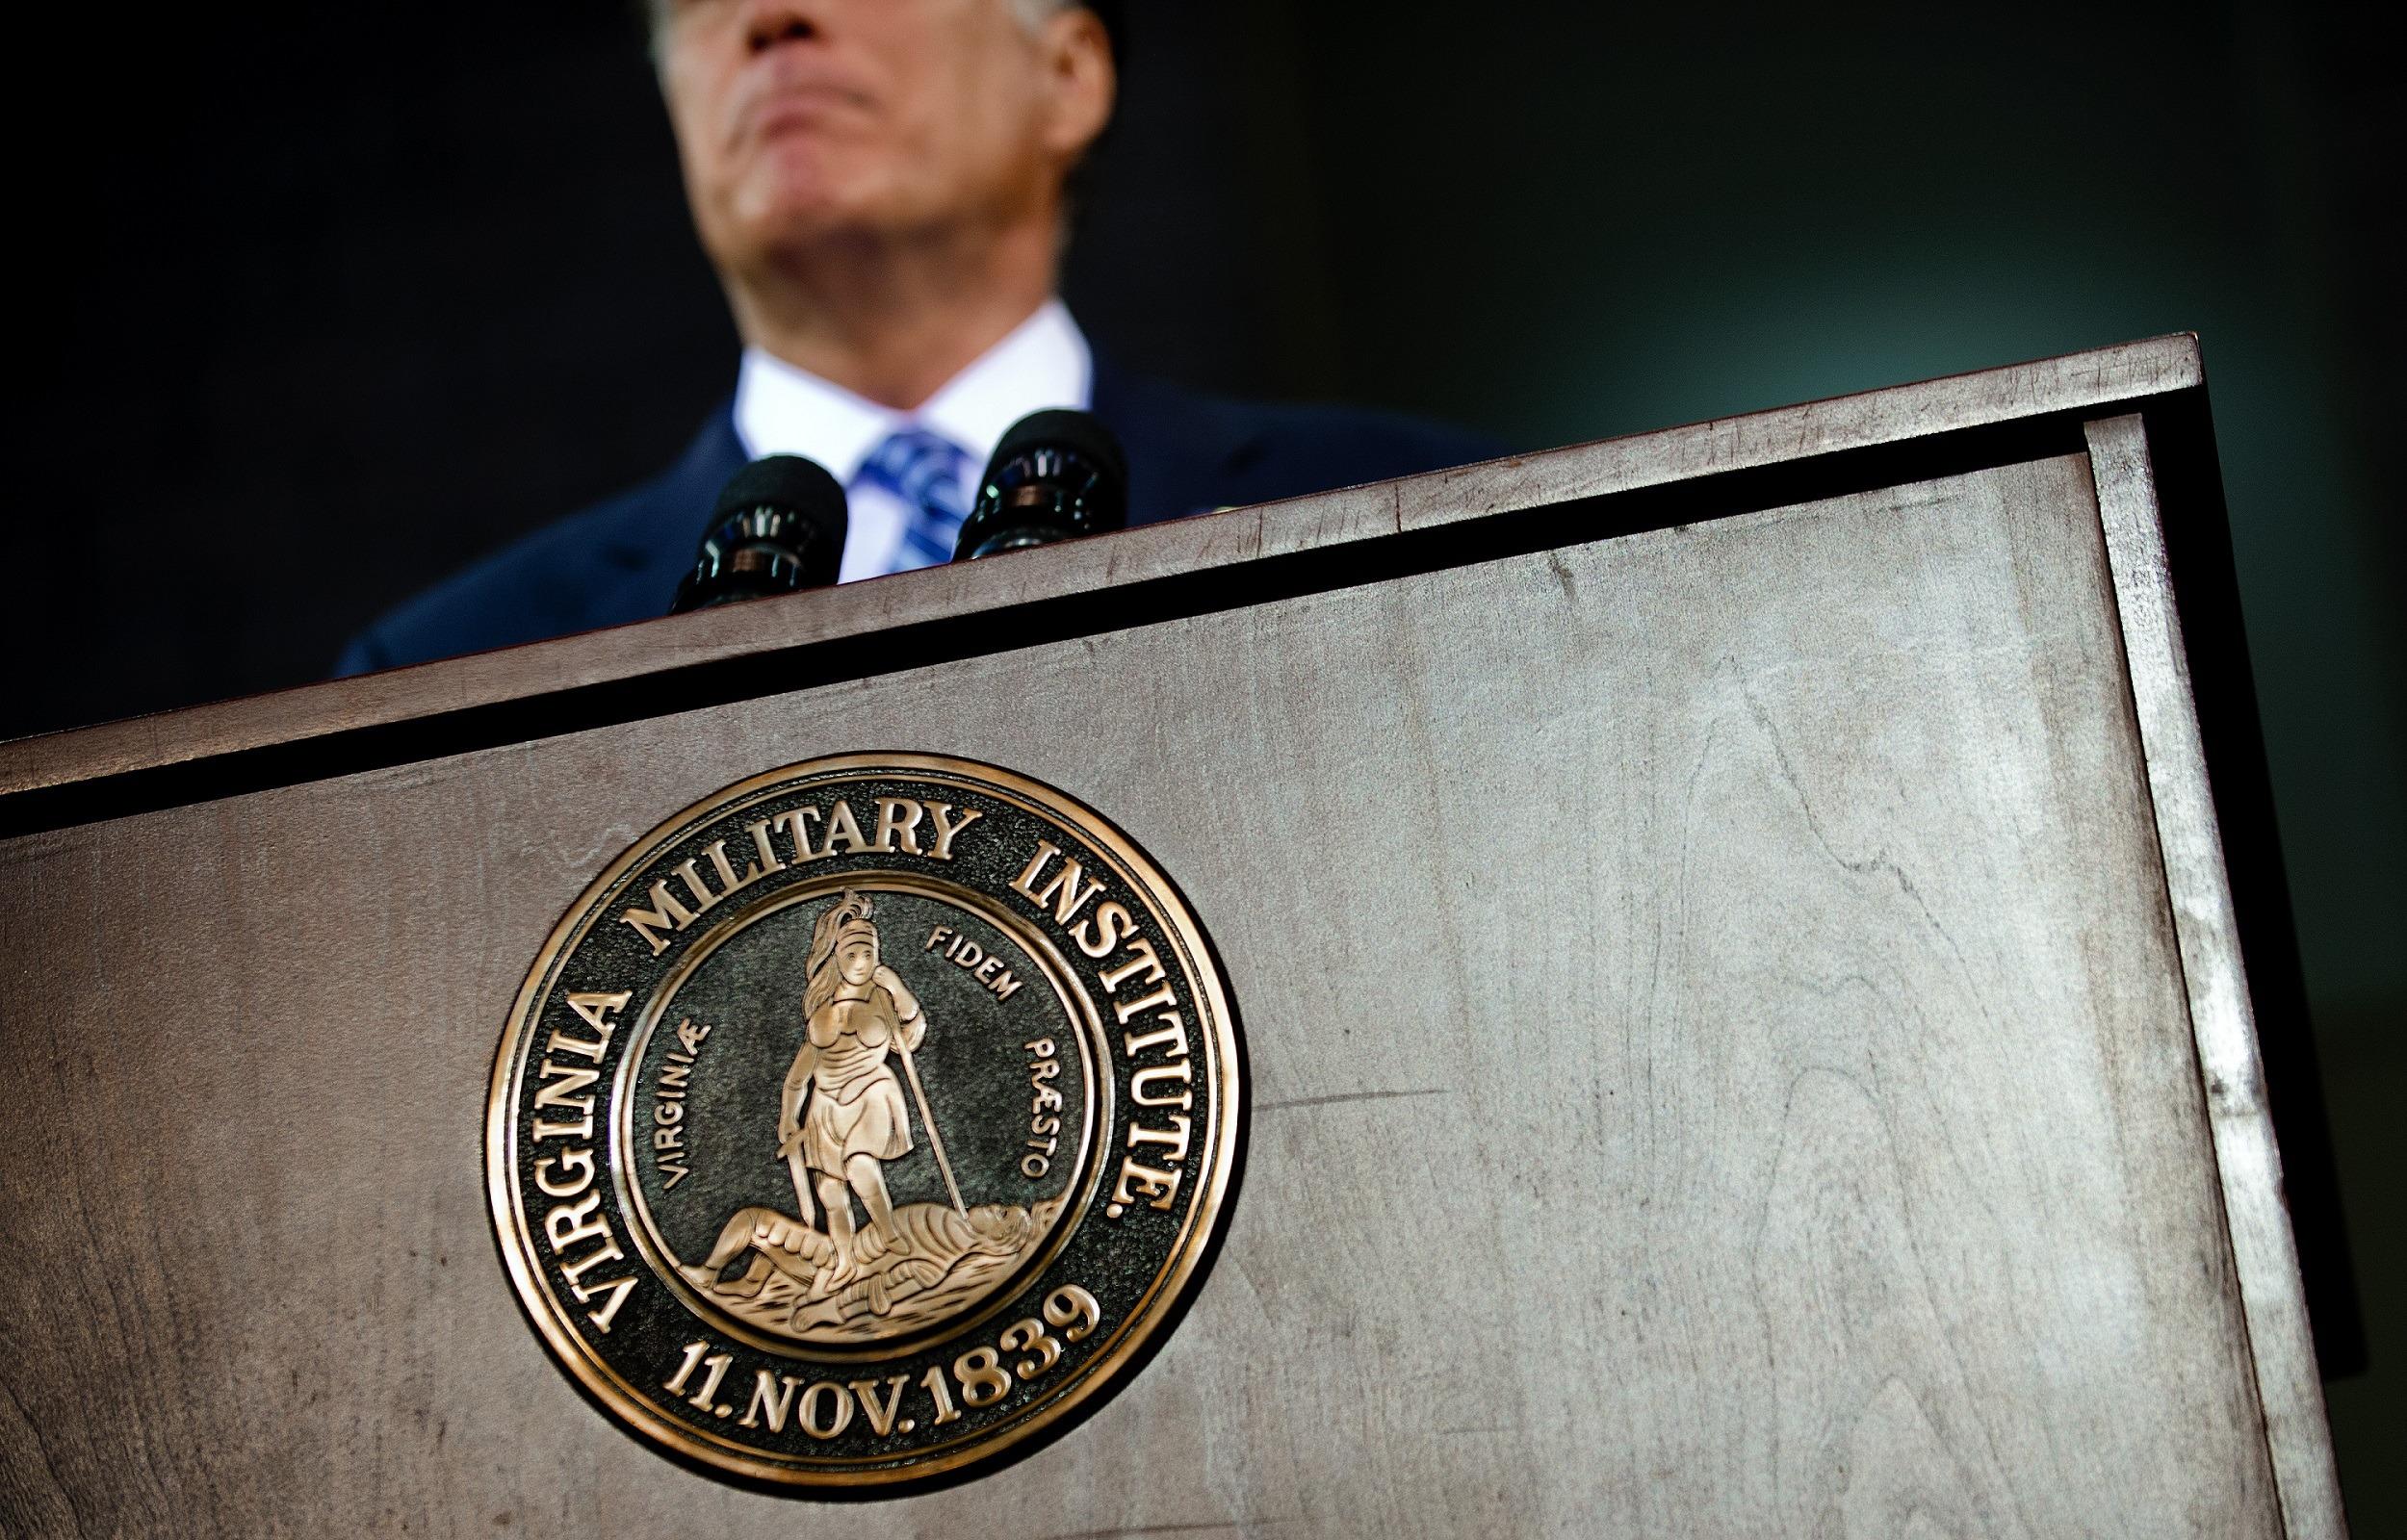 Presidential debate at the Virginia Military Institute